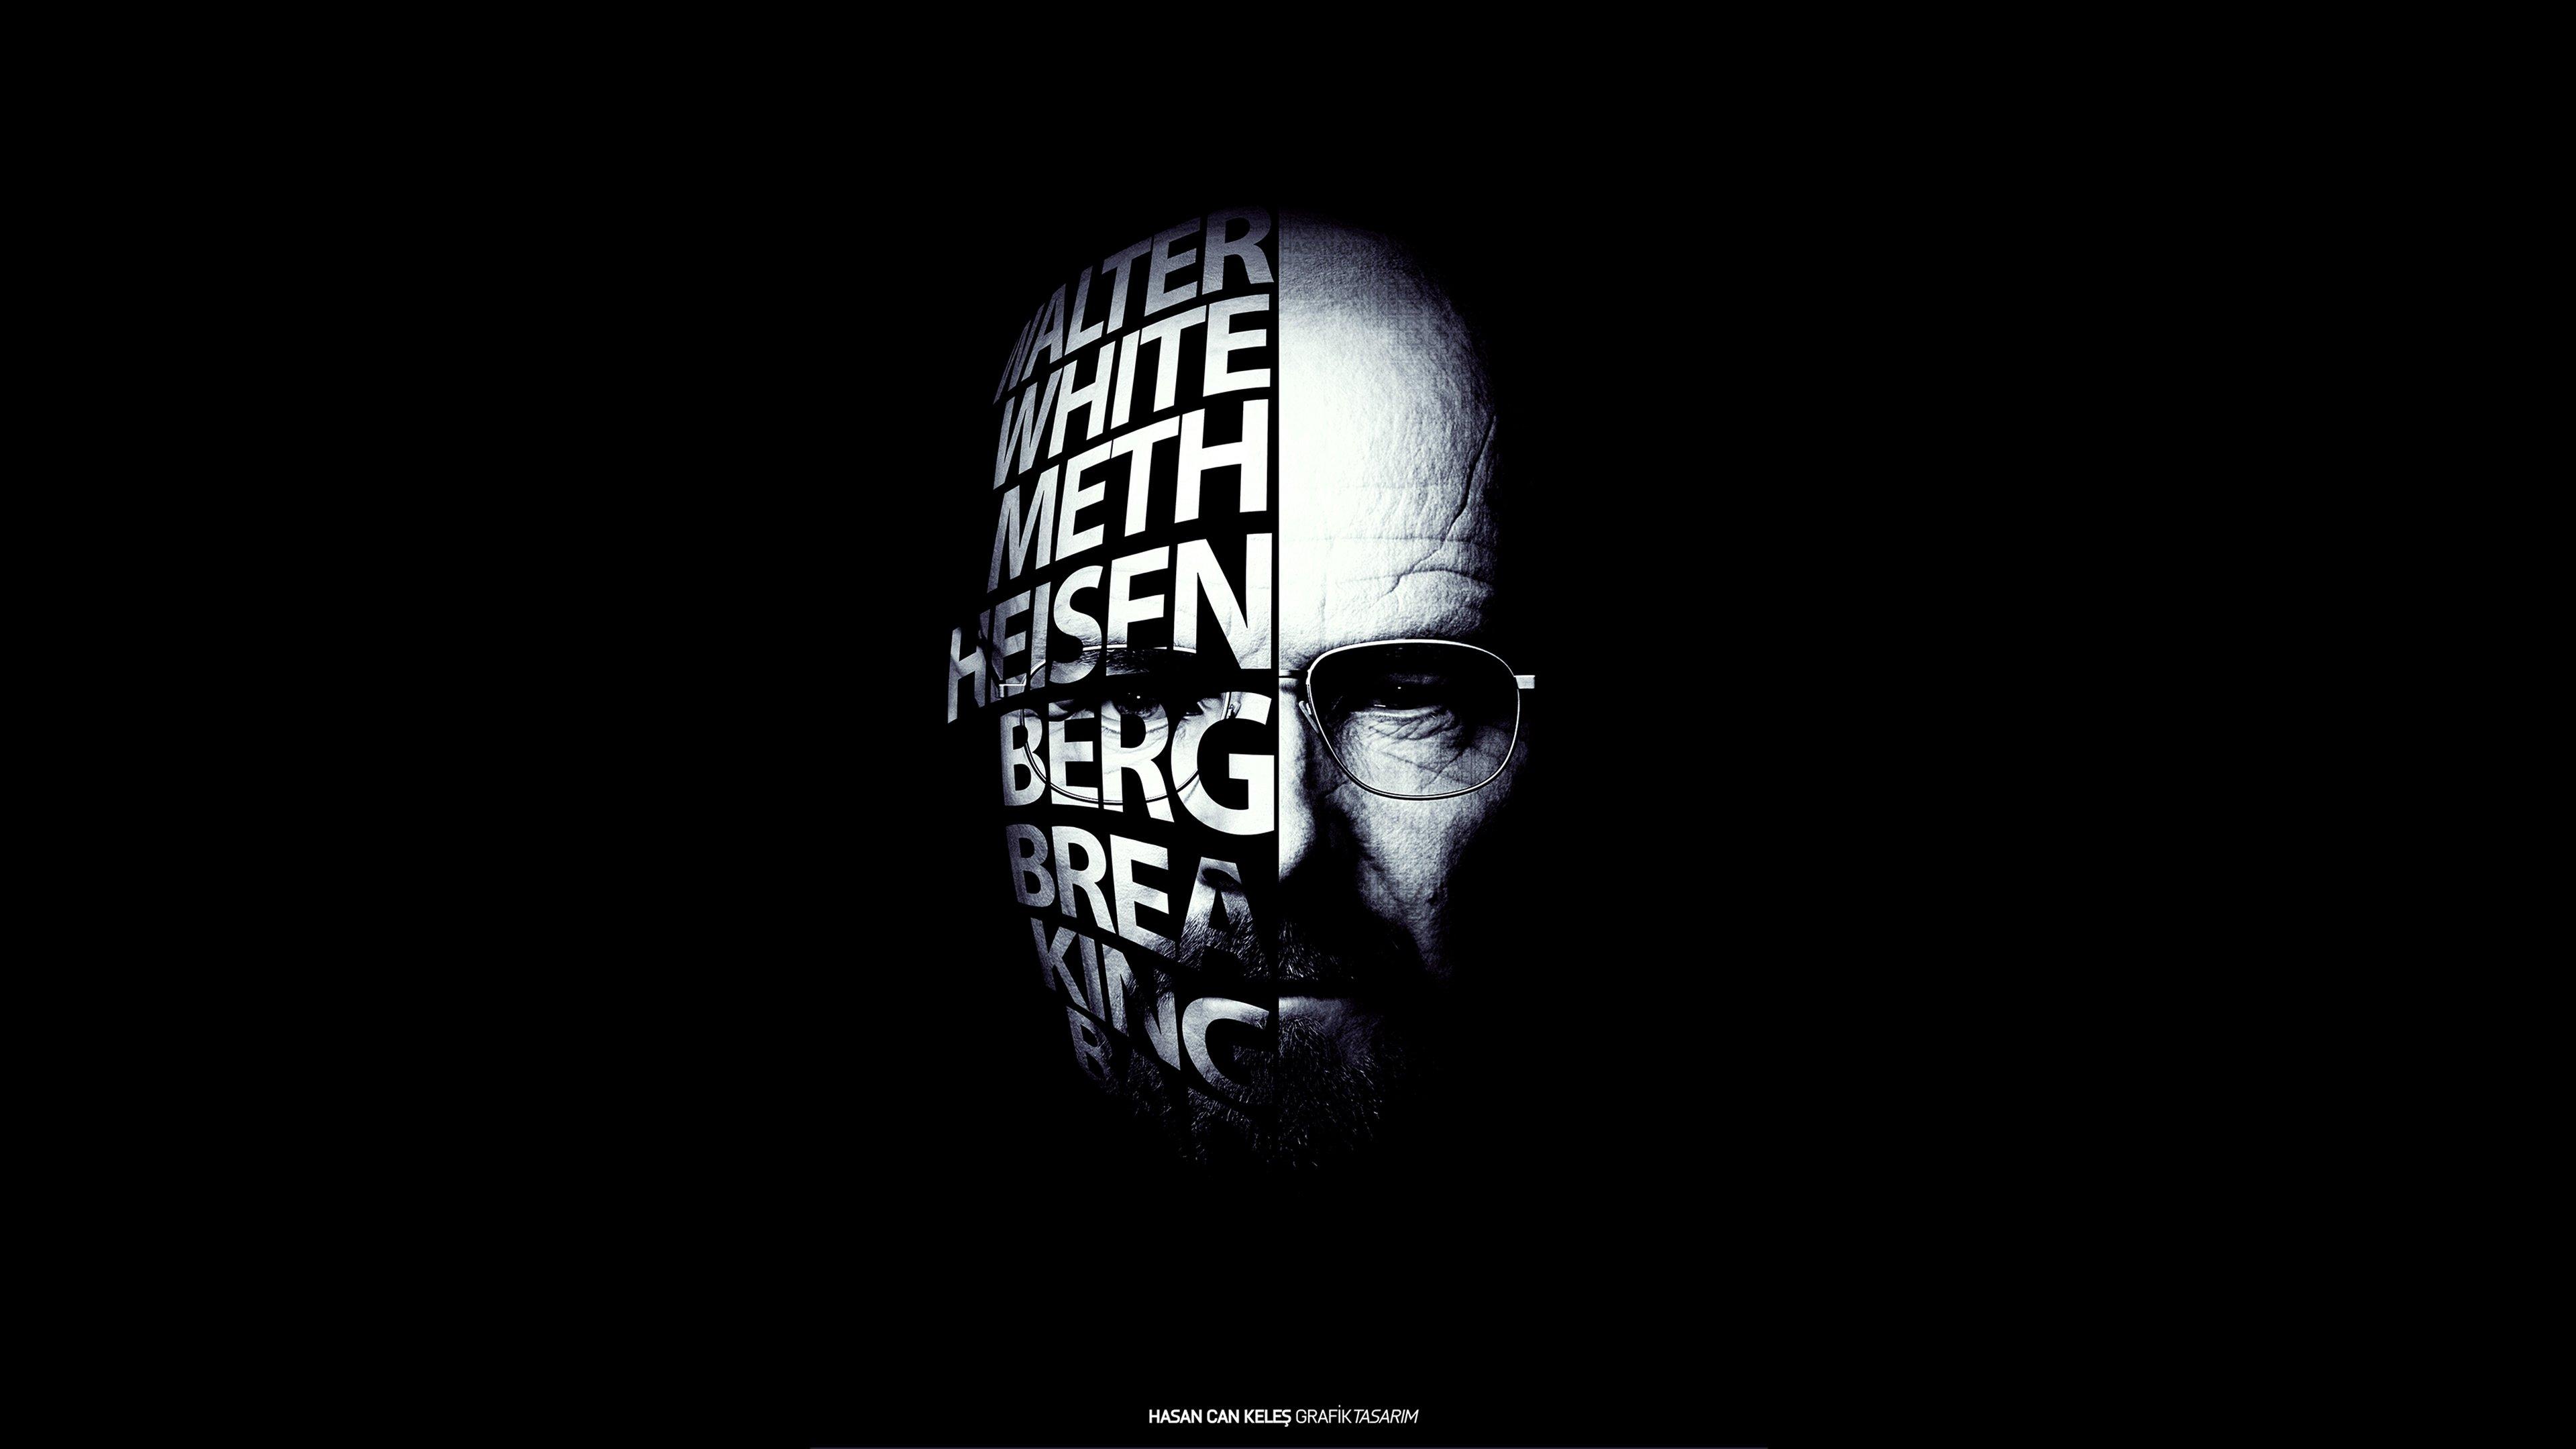 Heisenberg Breaking Bad Wallpaper 4k Ultra Hd Id3701